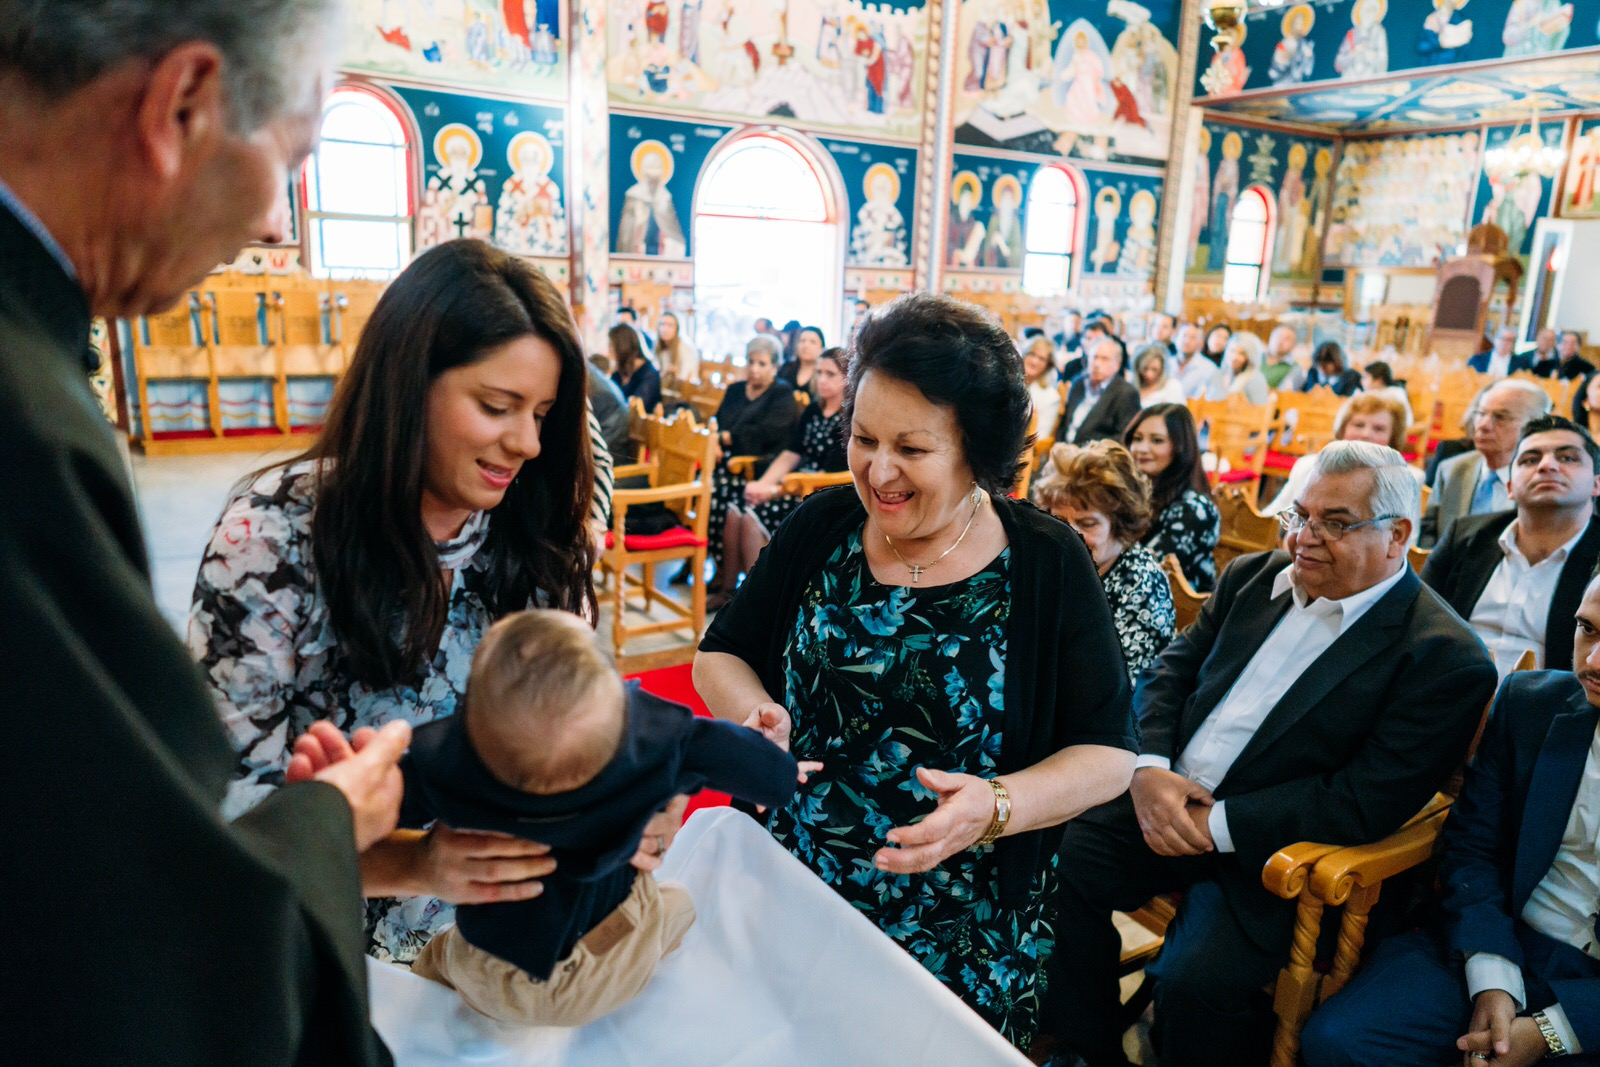 yianni-baptism-st-catherine-orthodox-mascot-laqua-86